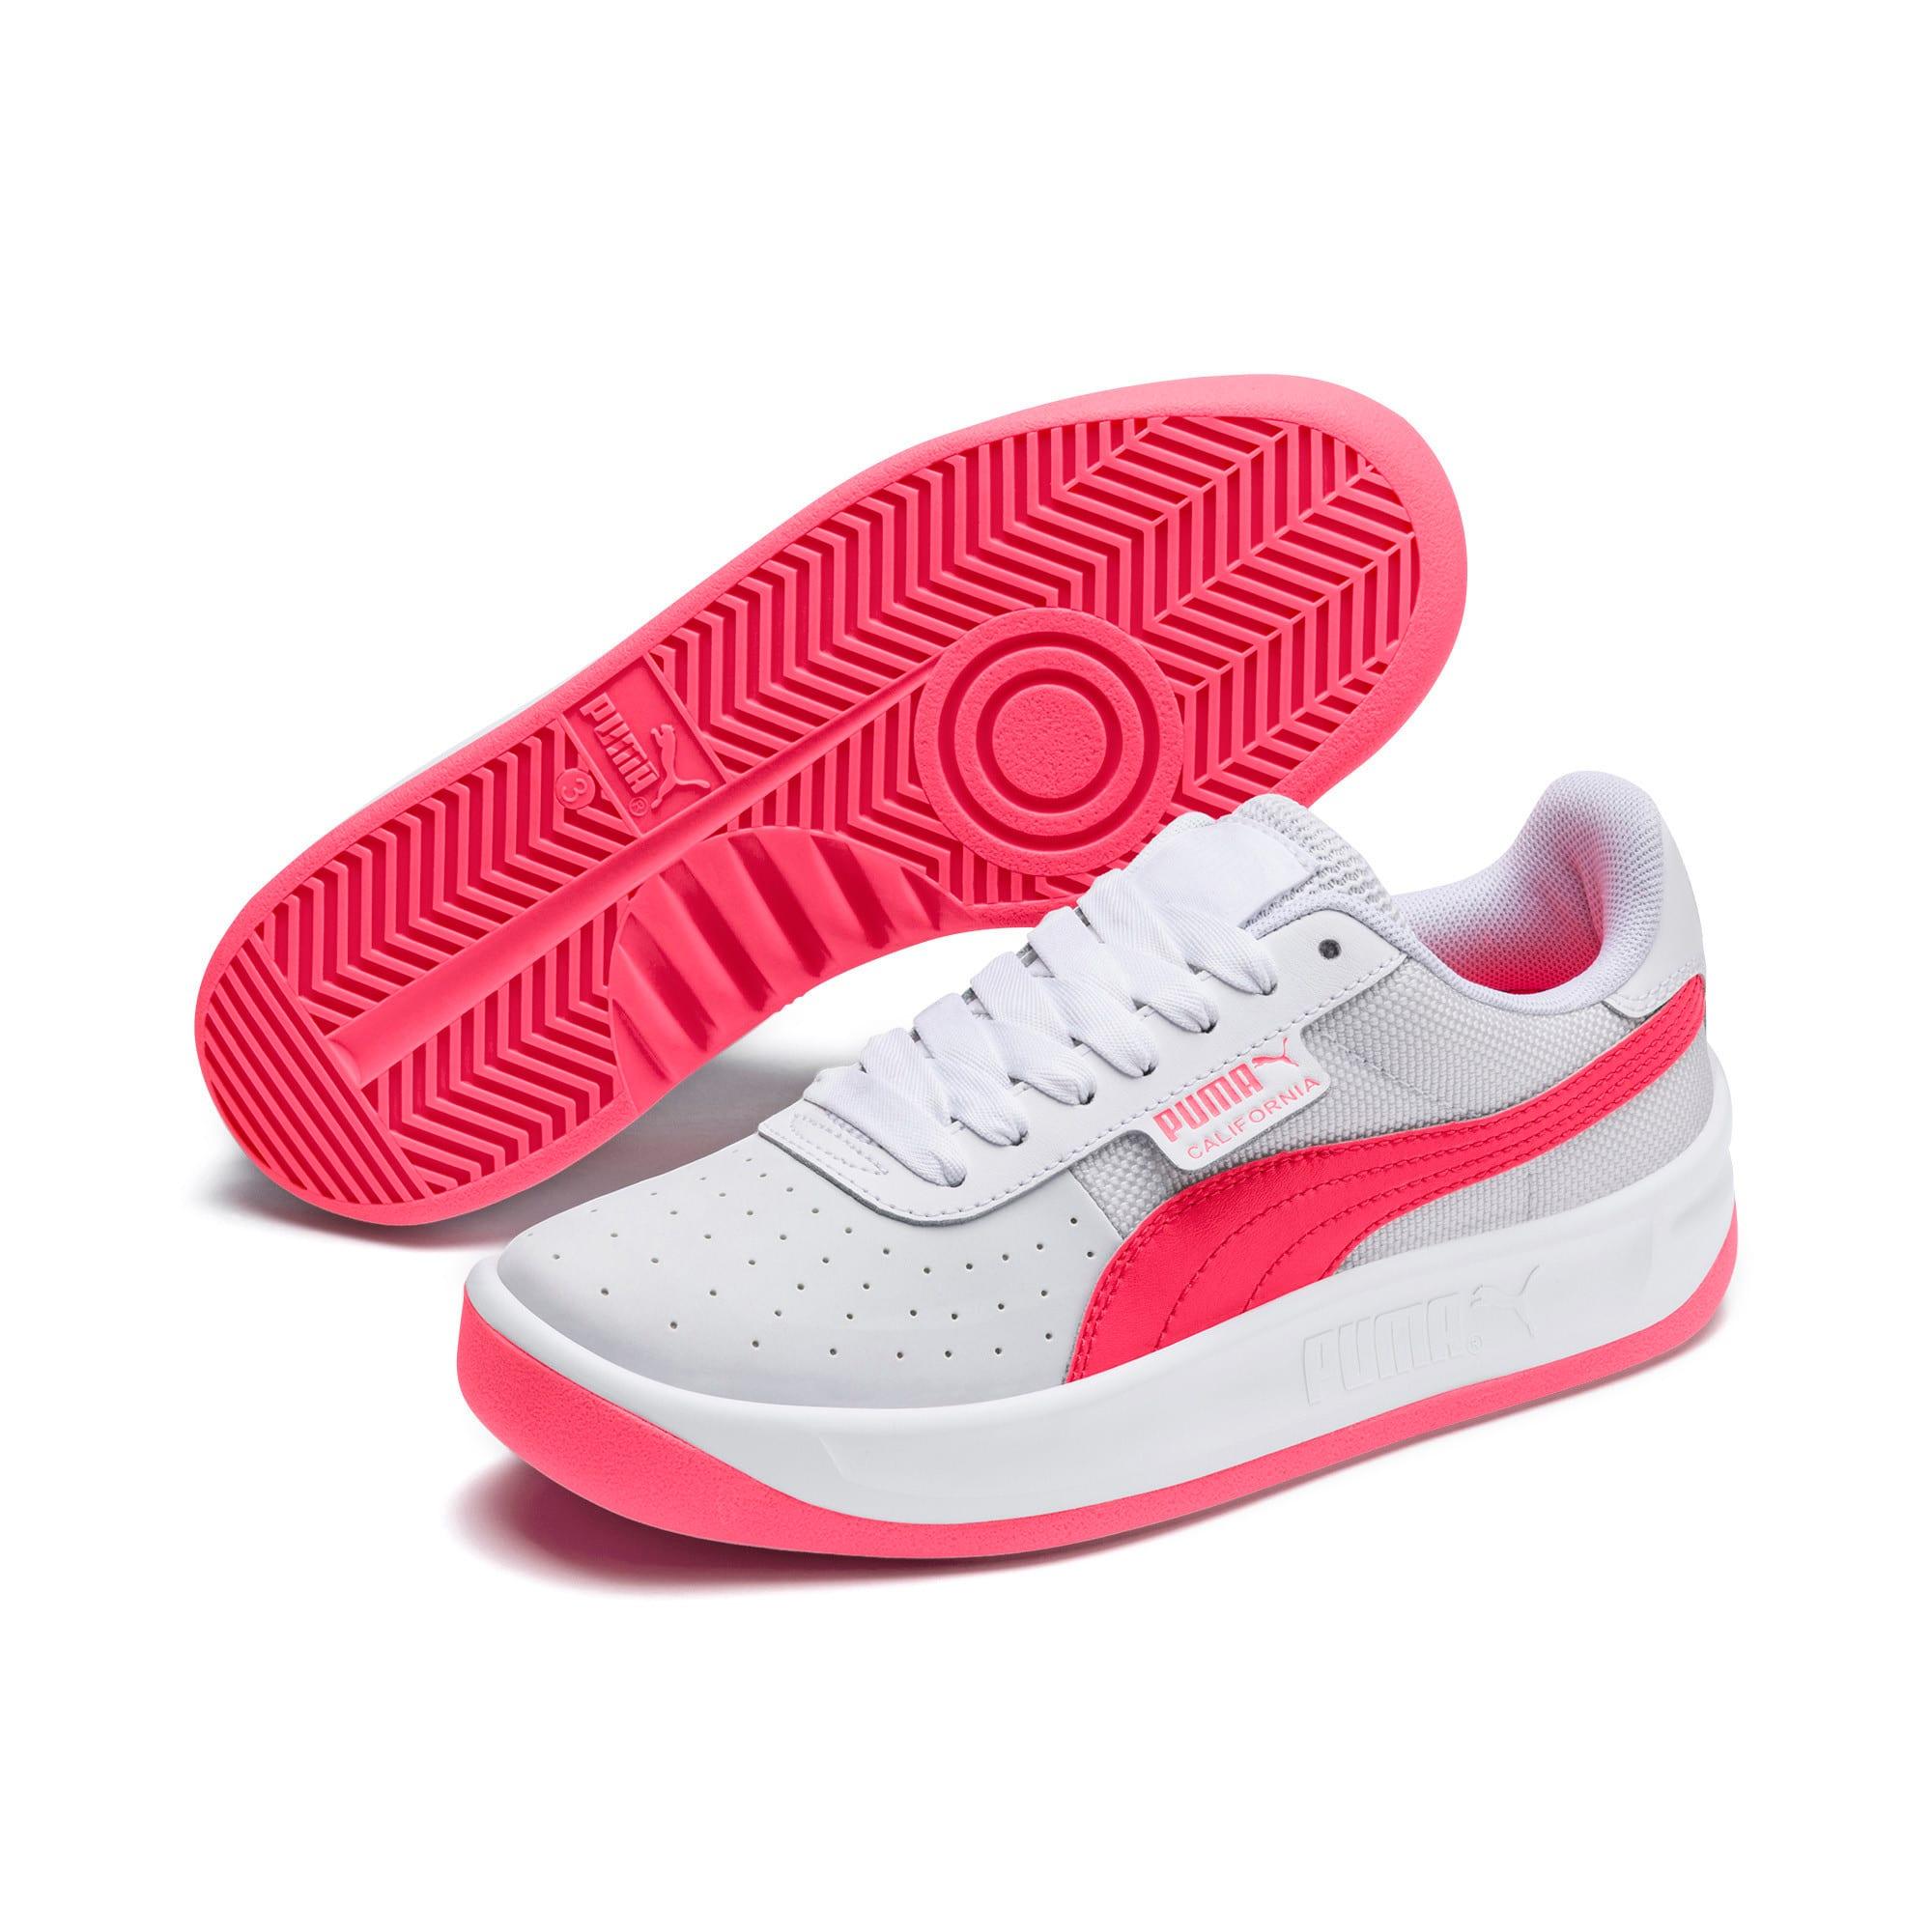 Thumbnail 2 of California Sneakers JR, Puma White-Pink Alert, medium